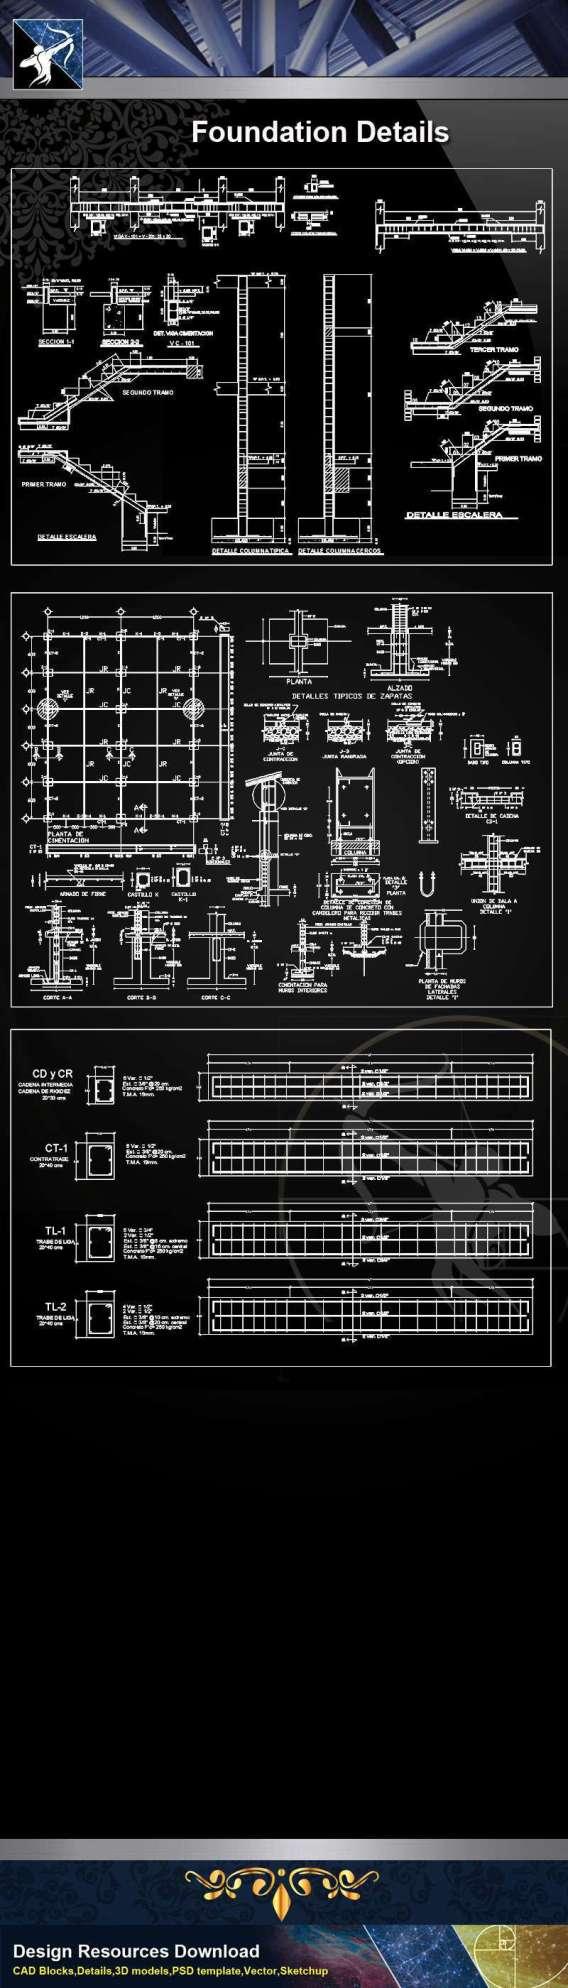 【Architecture CAD Details Collections】Foundation CAD Details